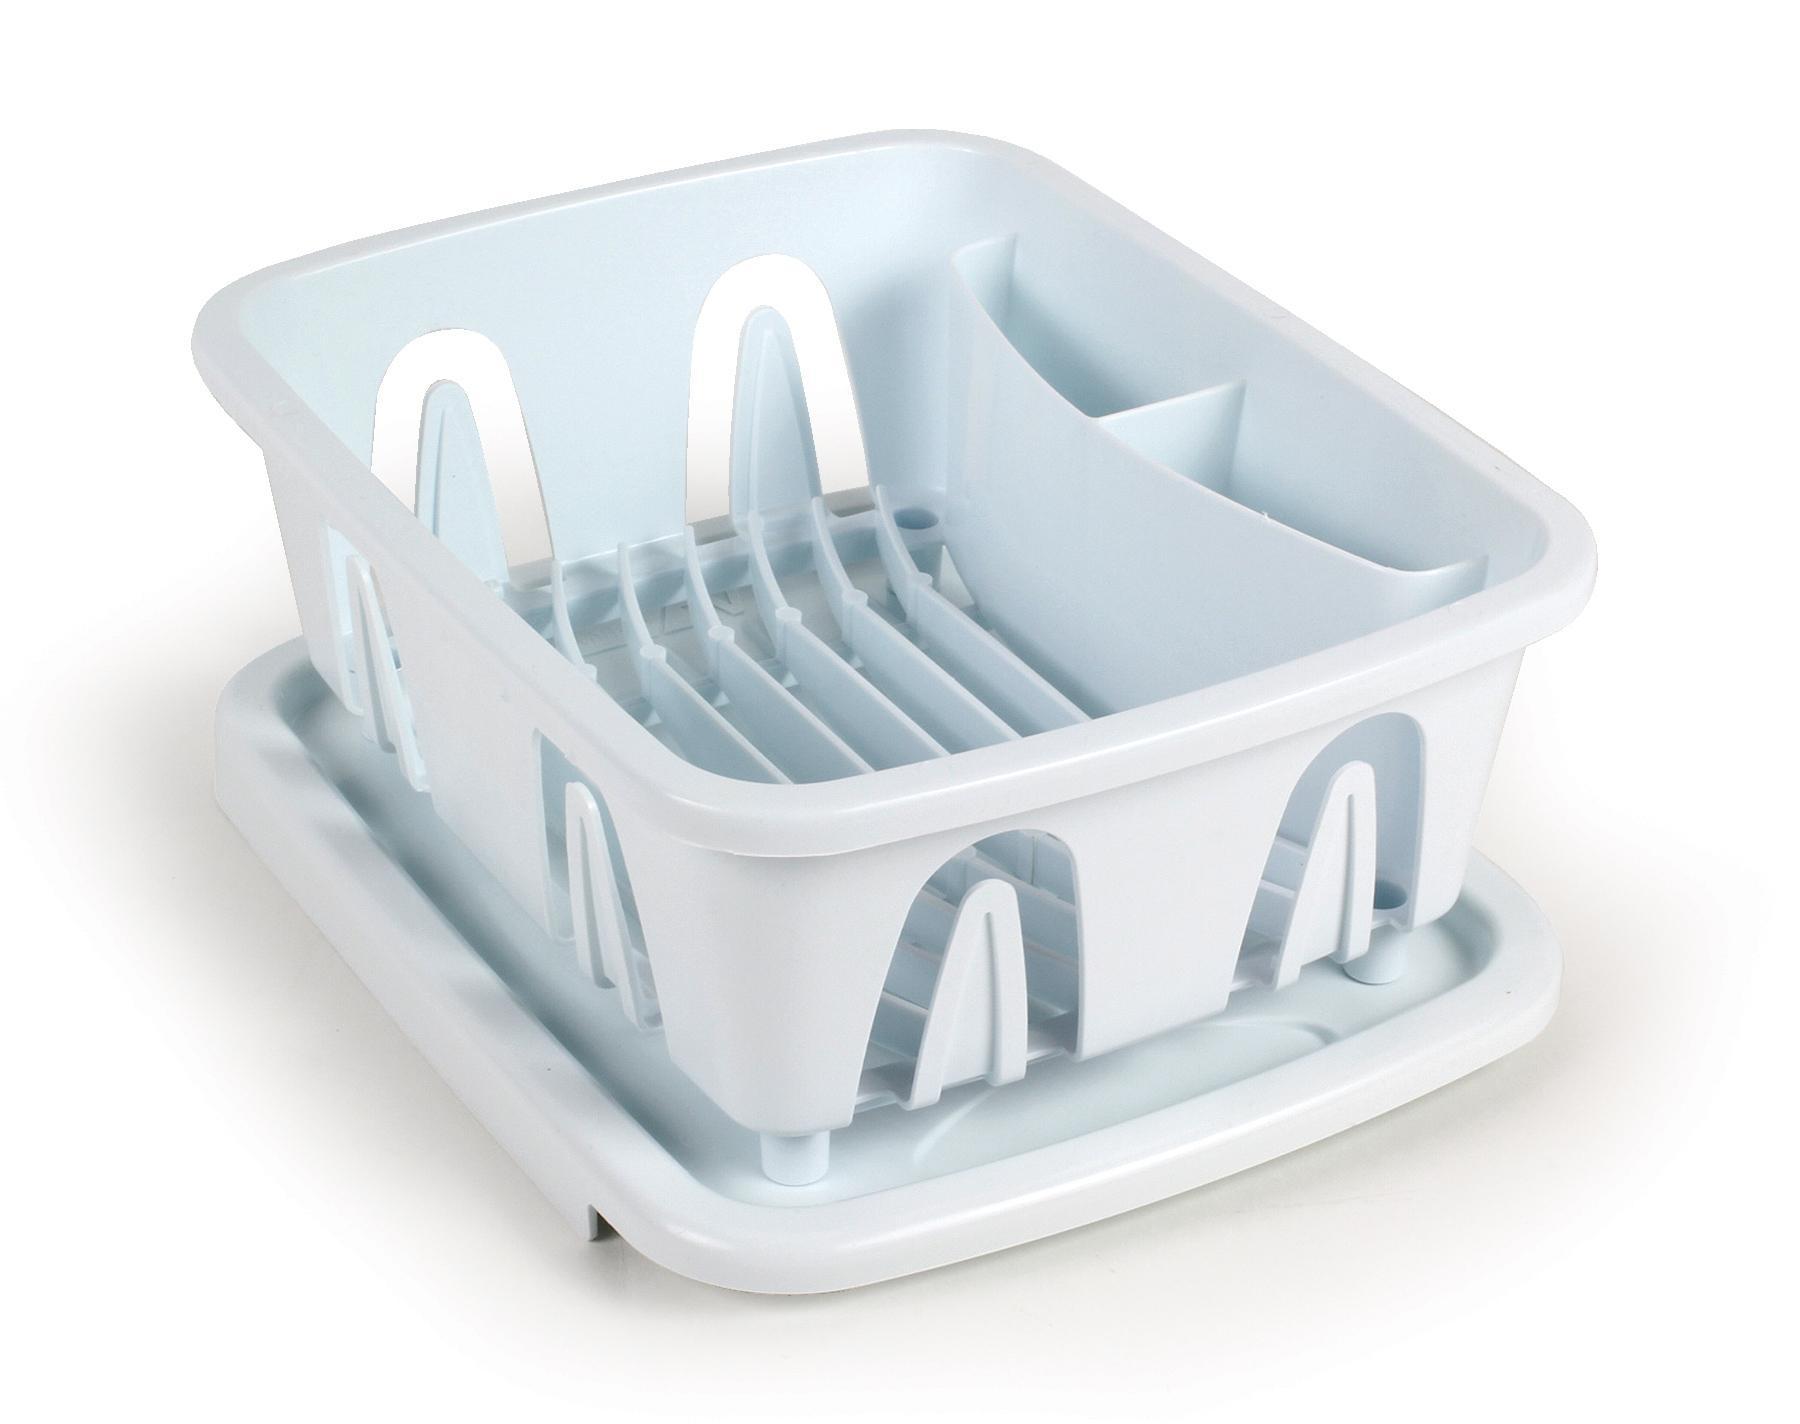 dish tray mini drainer lid sinks storage counters dry kitchen dessert cat bowl ebay. Black Bedroom Furniture Sets. Home Design Ideas